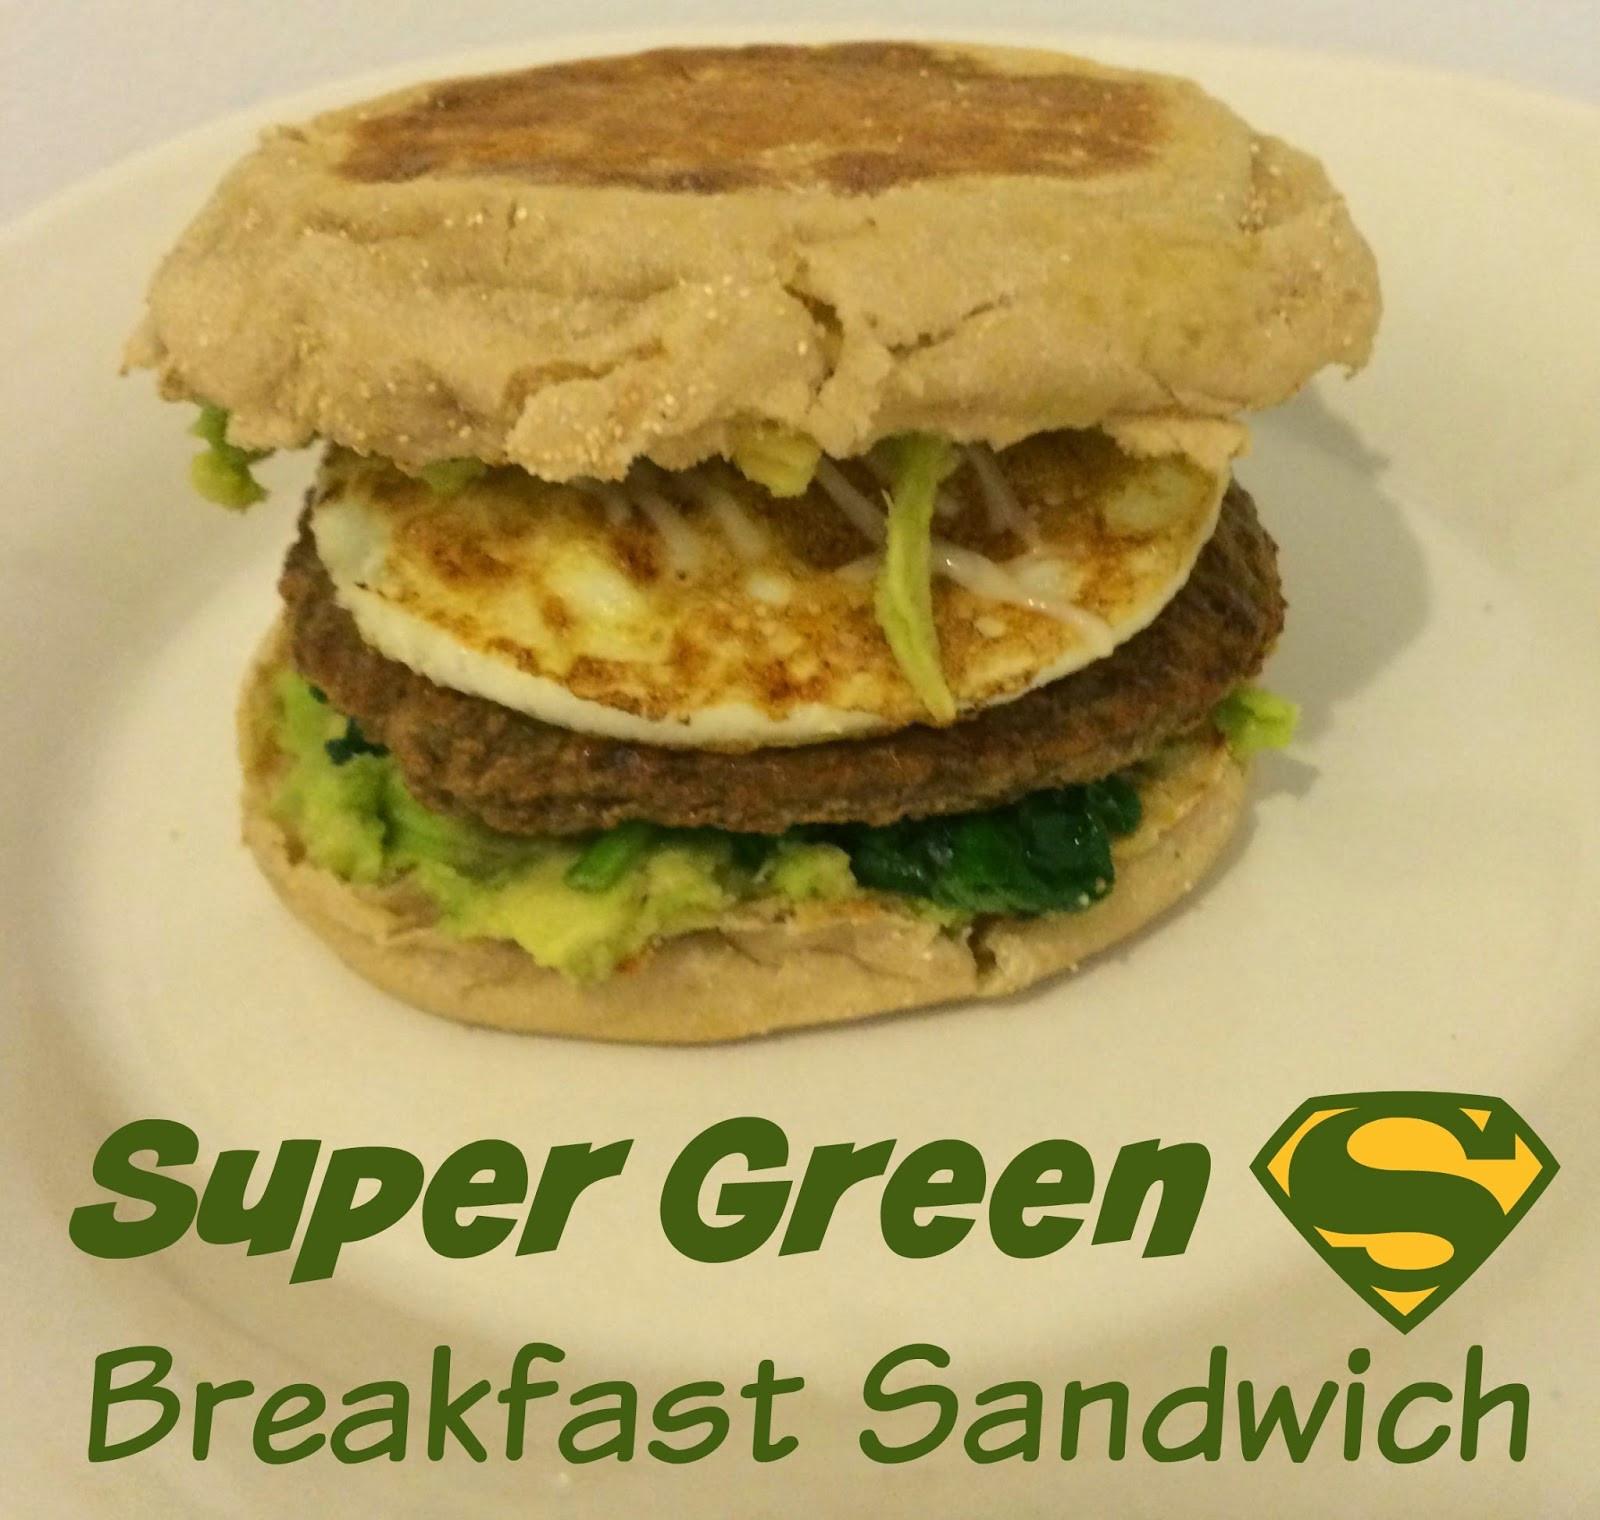 Super Healthy Breakfast  Super Green Super Healthy Breakfast Sandwich First Time